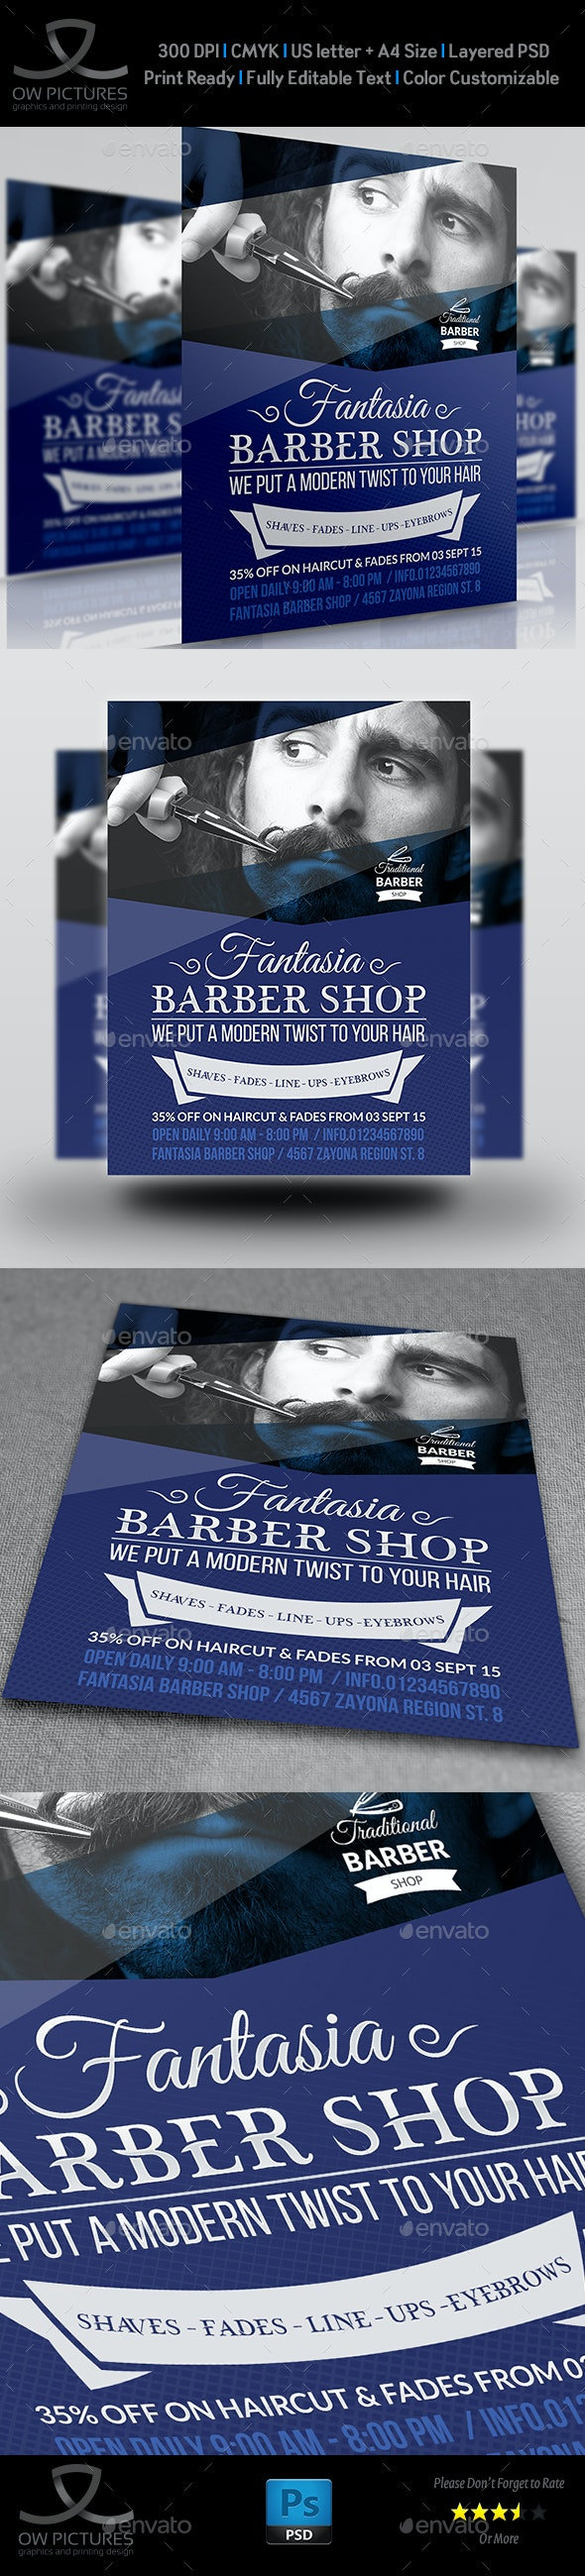 Barber Shop Flyer Template Vol.2 - Flyers Print Templates